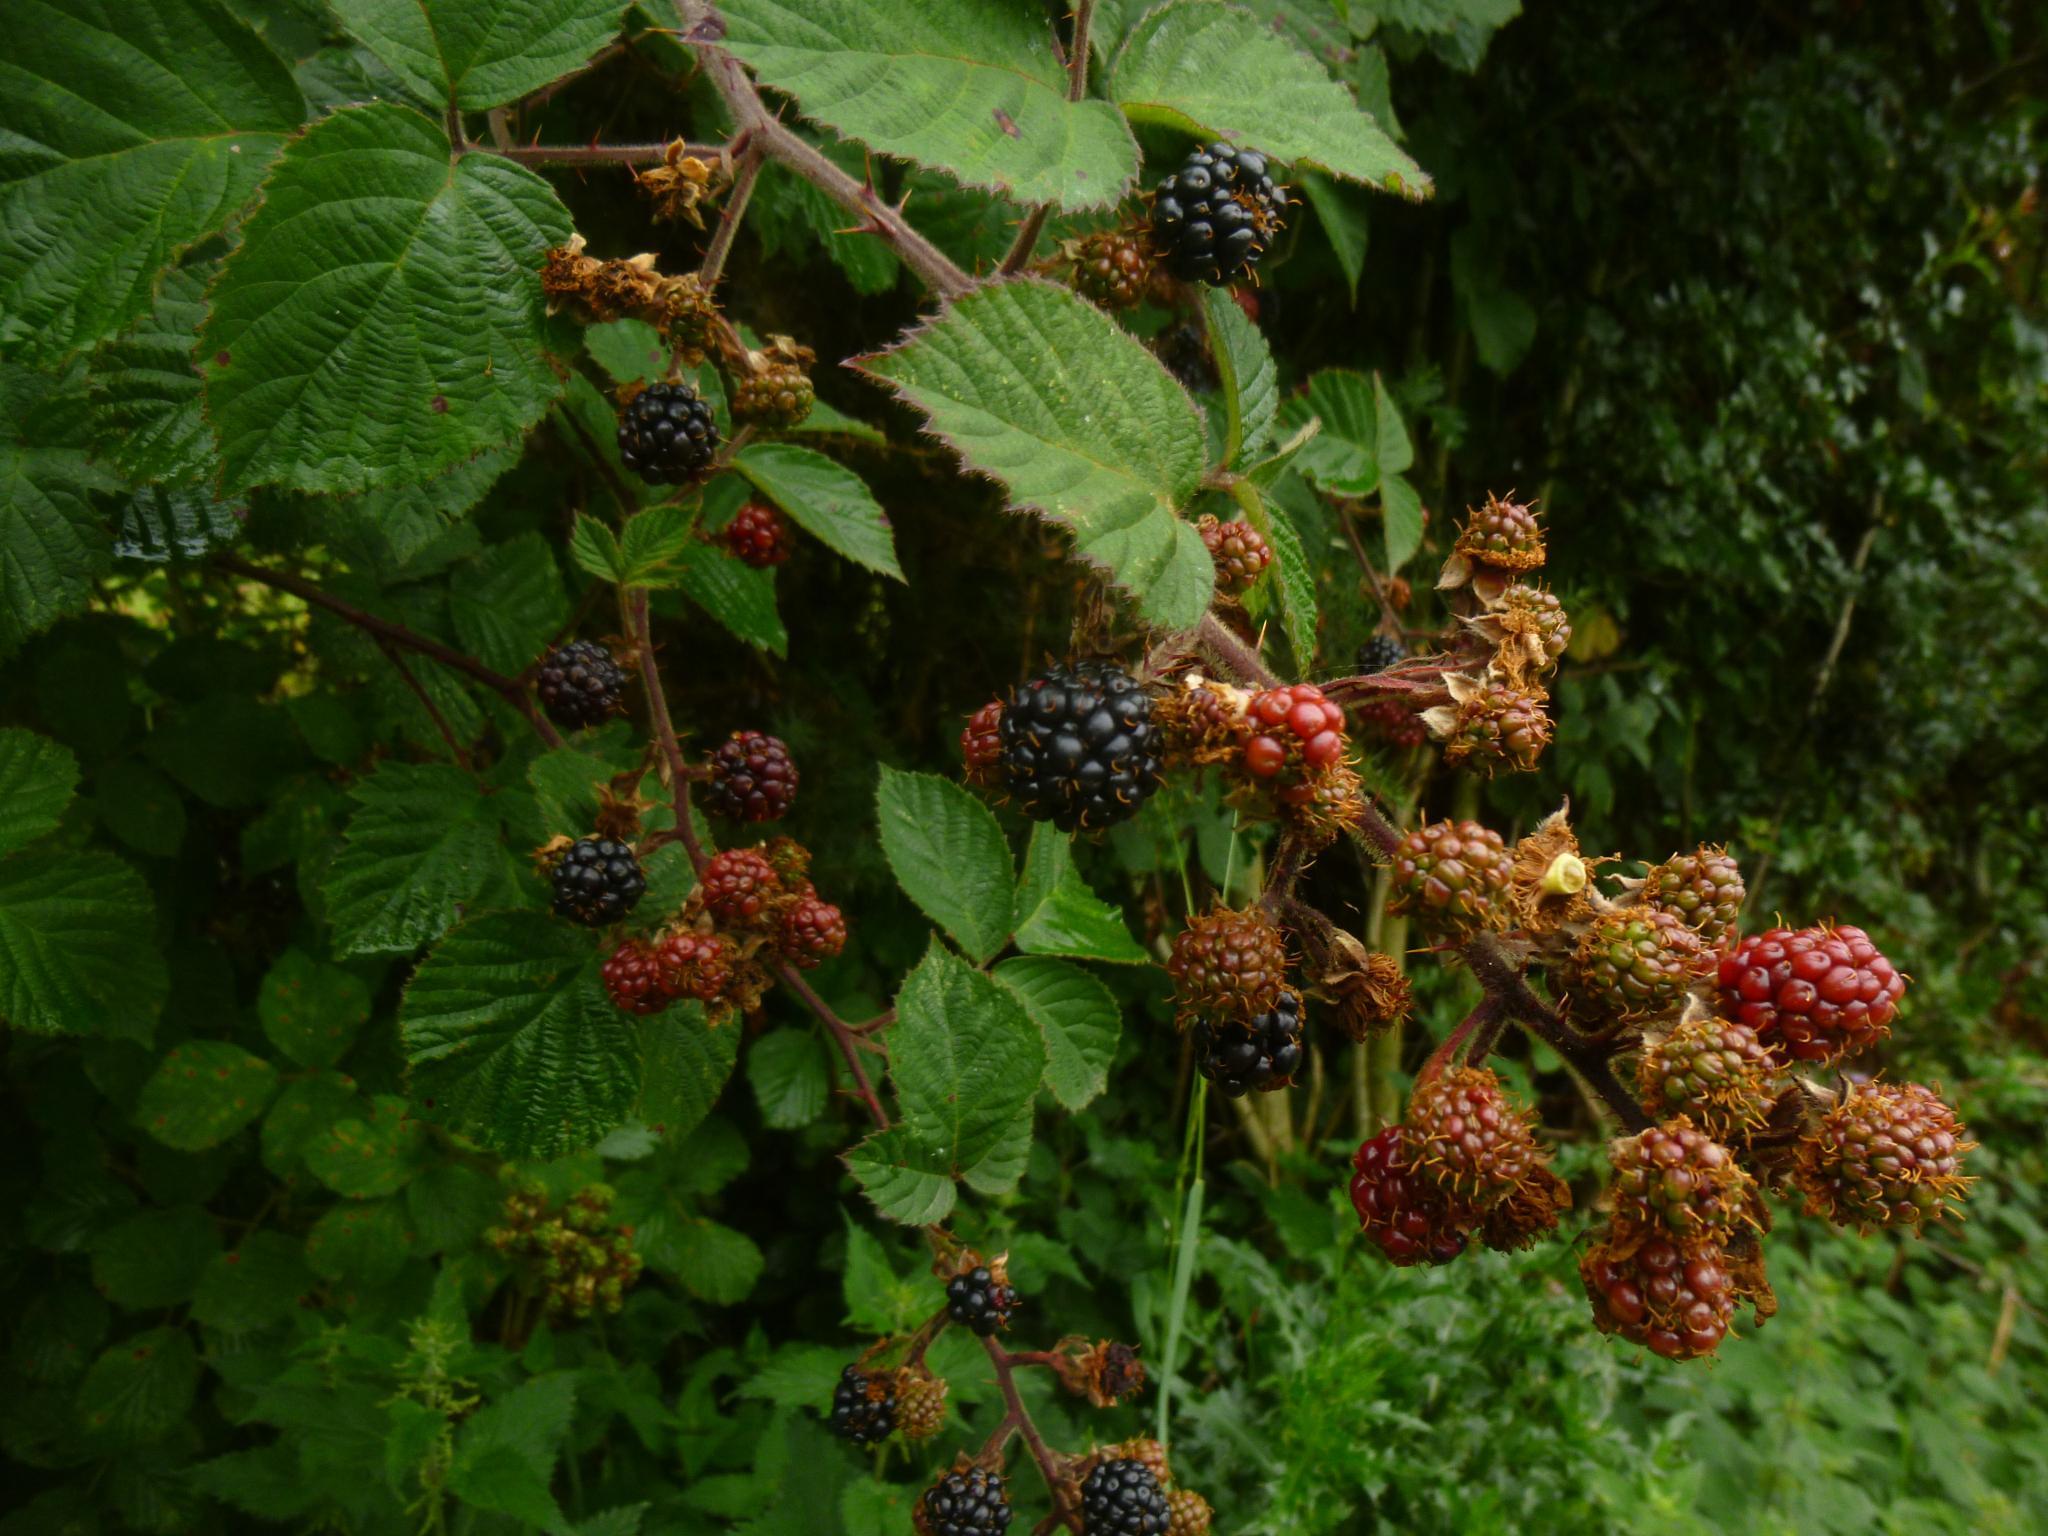 blackberry by chris.adams.3557